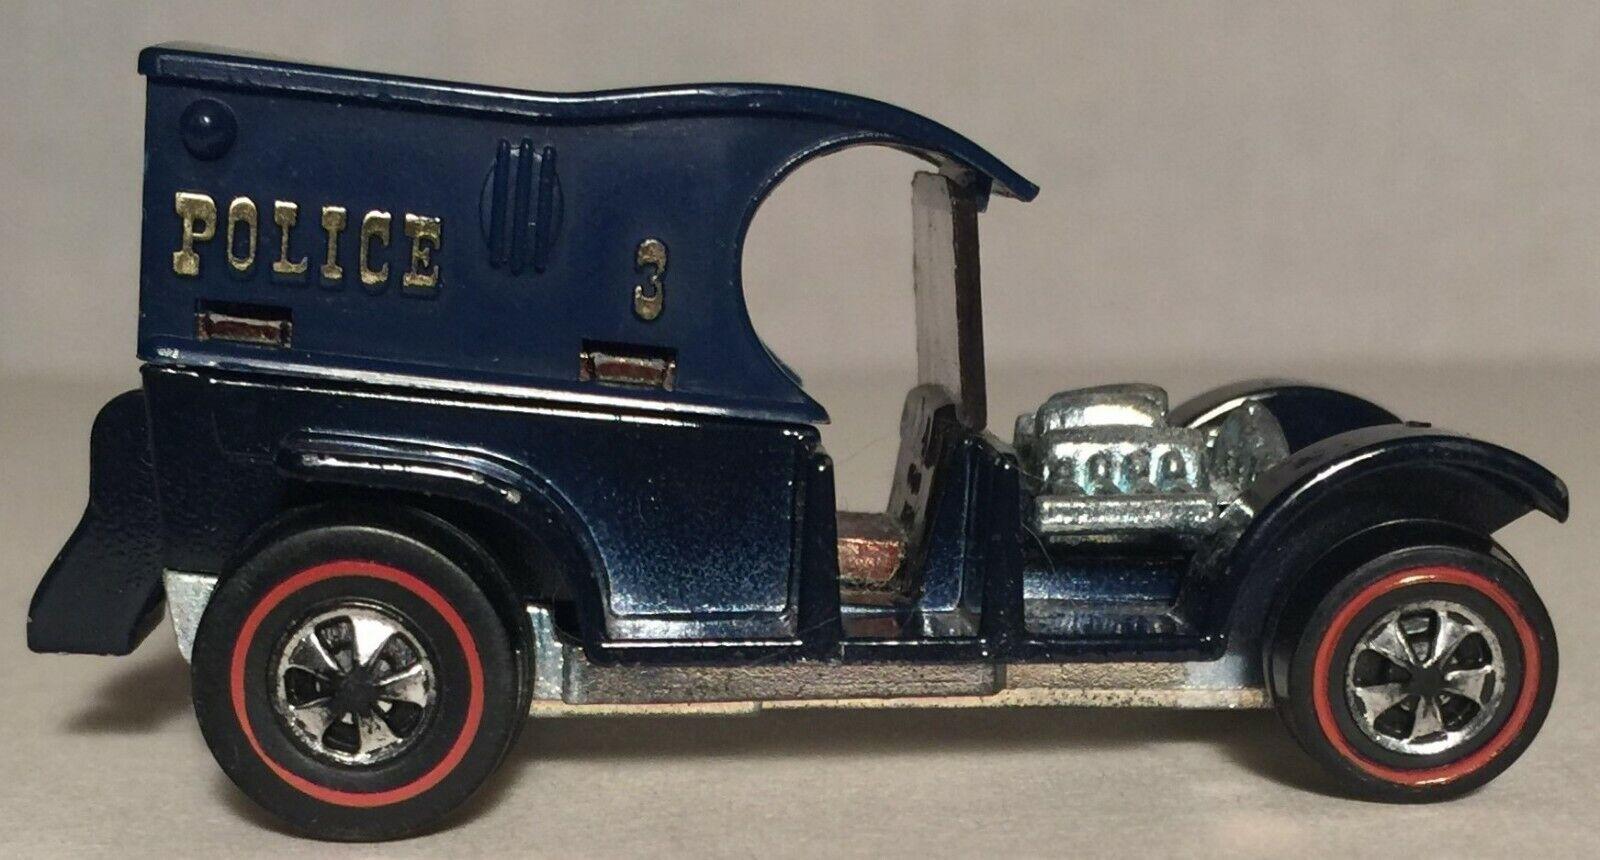 Police Paddy Wagon Redline Nice Vintage Original 1970 Hot Wheels